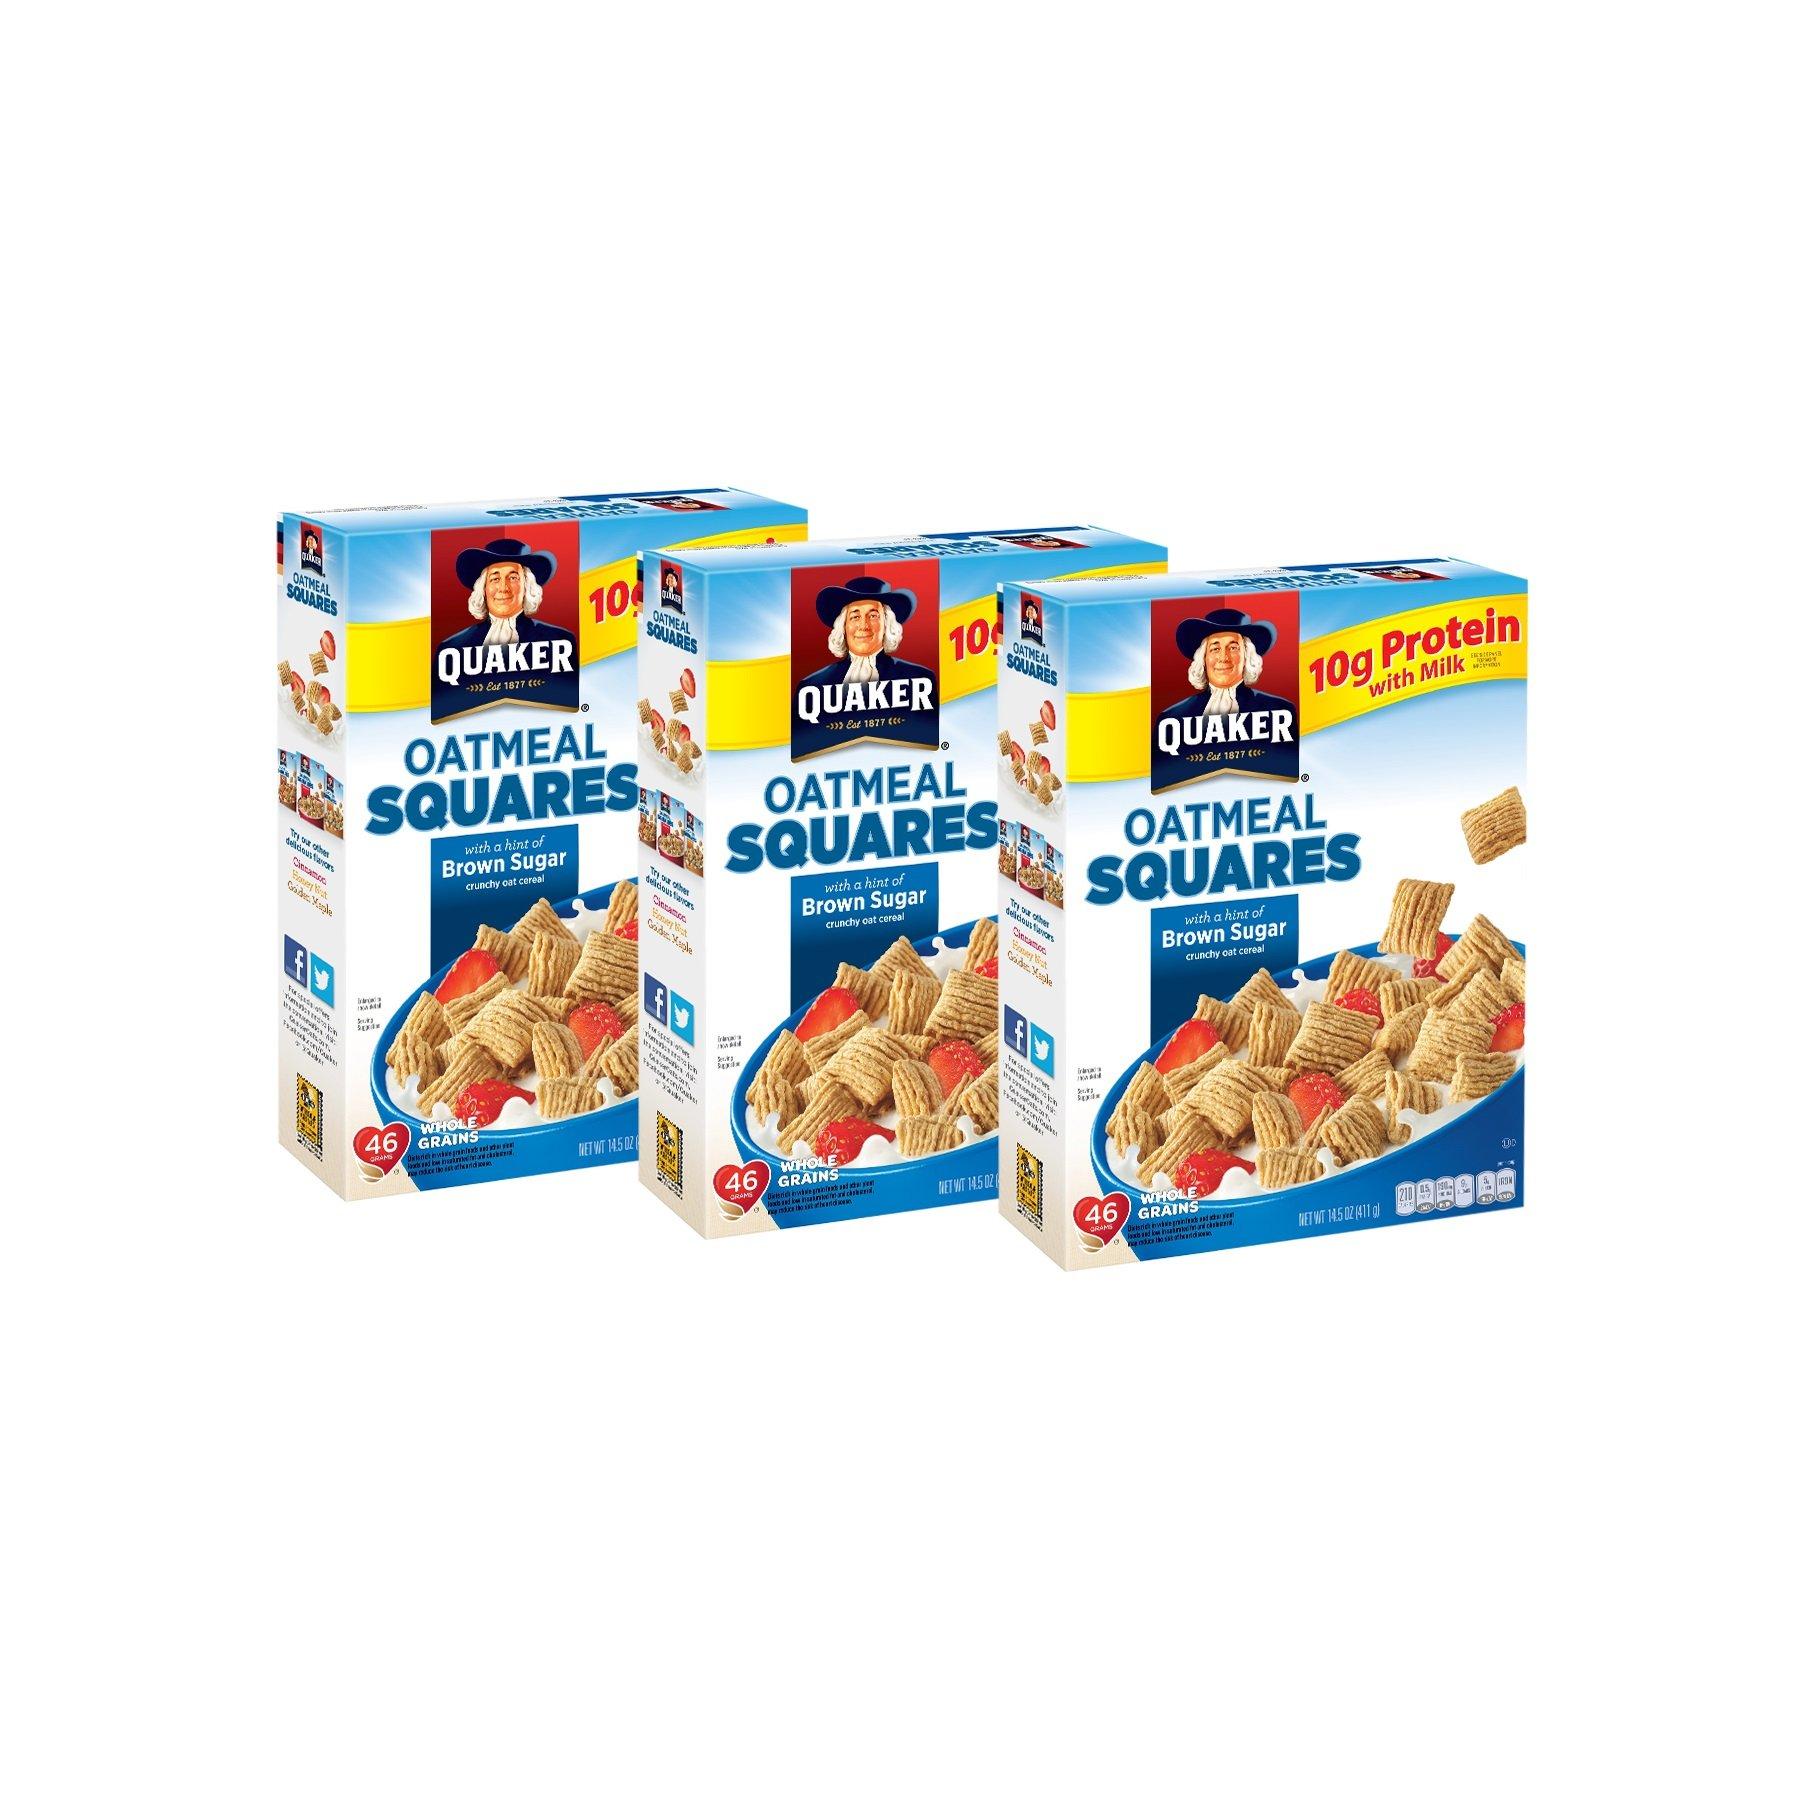 Quaker Oatmeal Squares, Brown Sugar, 14.5 Oz (Pack of 3)